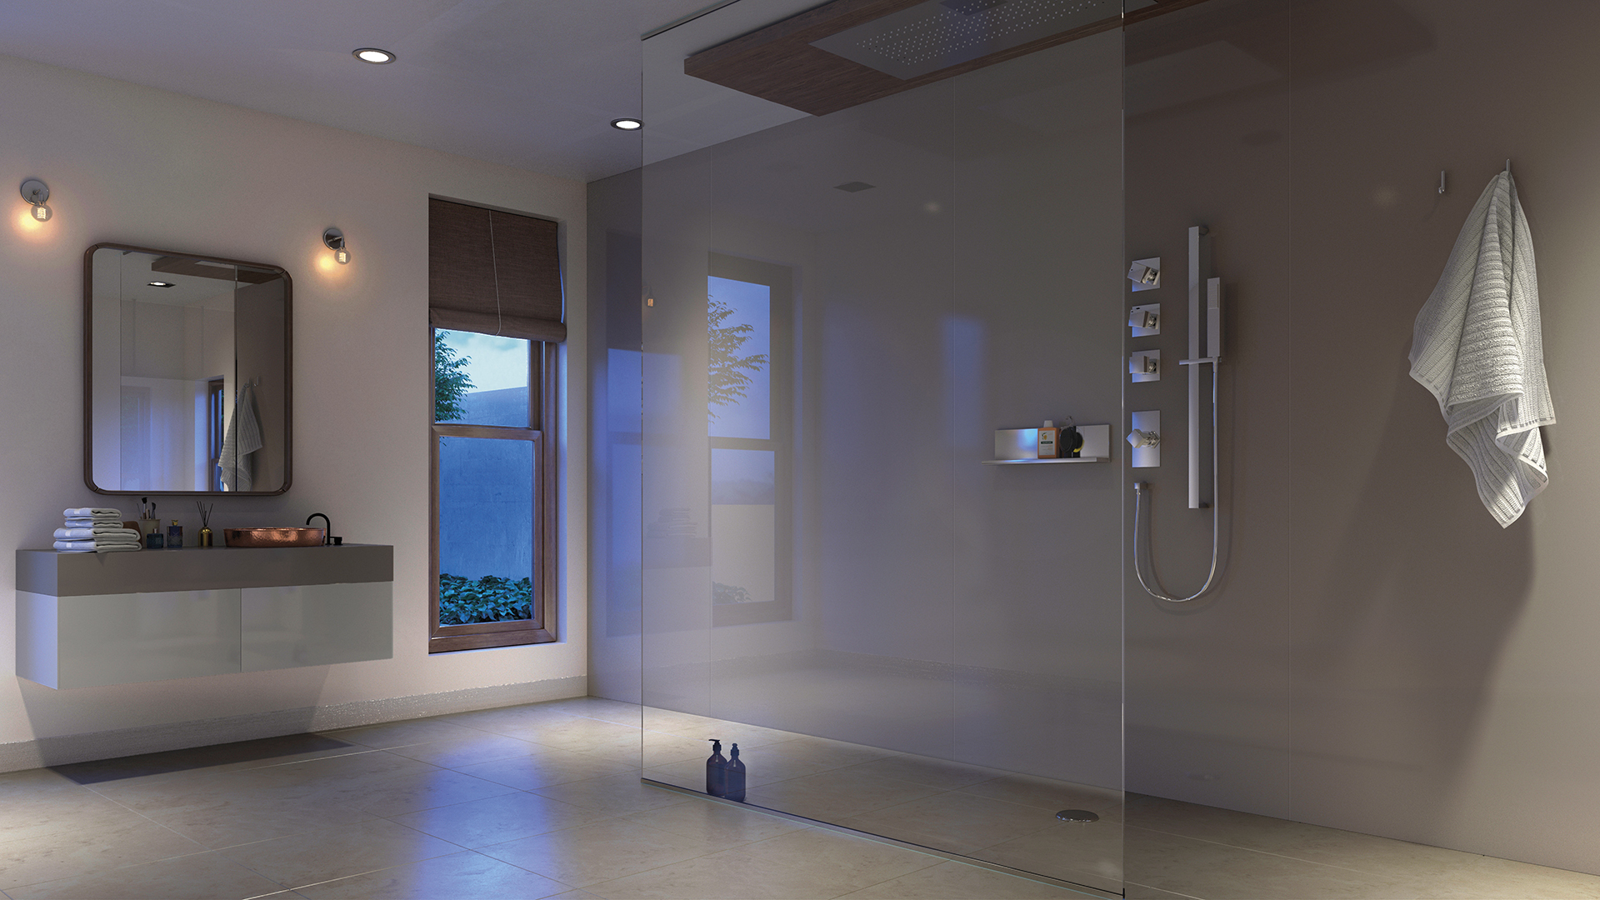 Showerwall panel in a clean modern bathroom in acrylic mocha finish